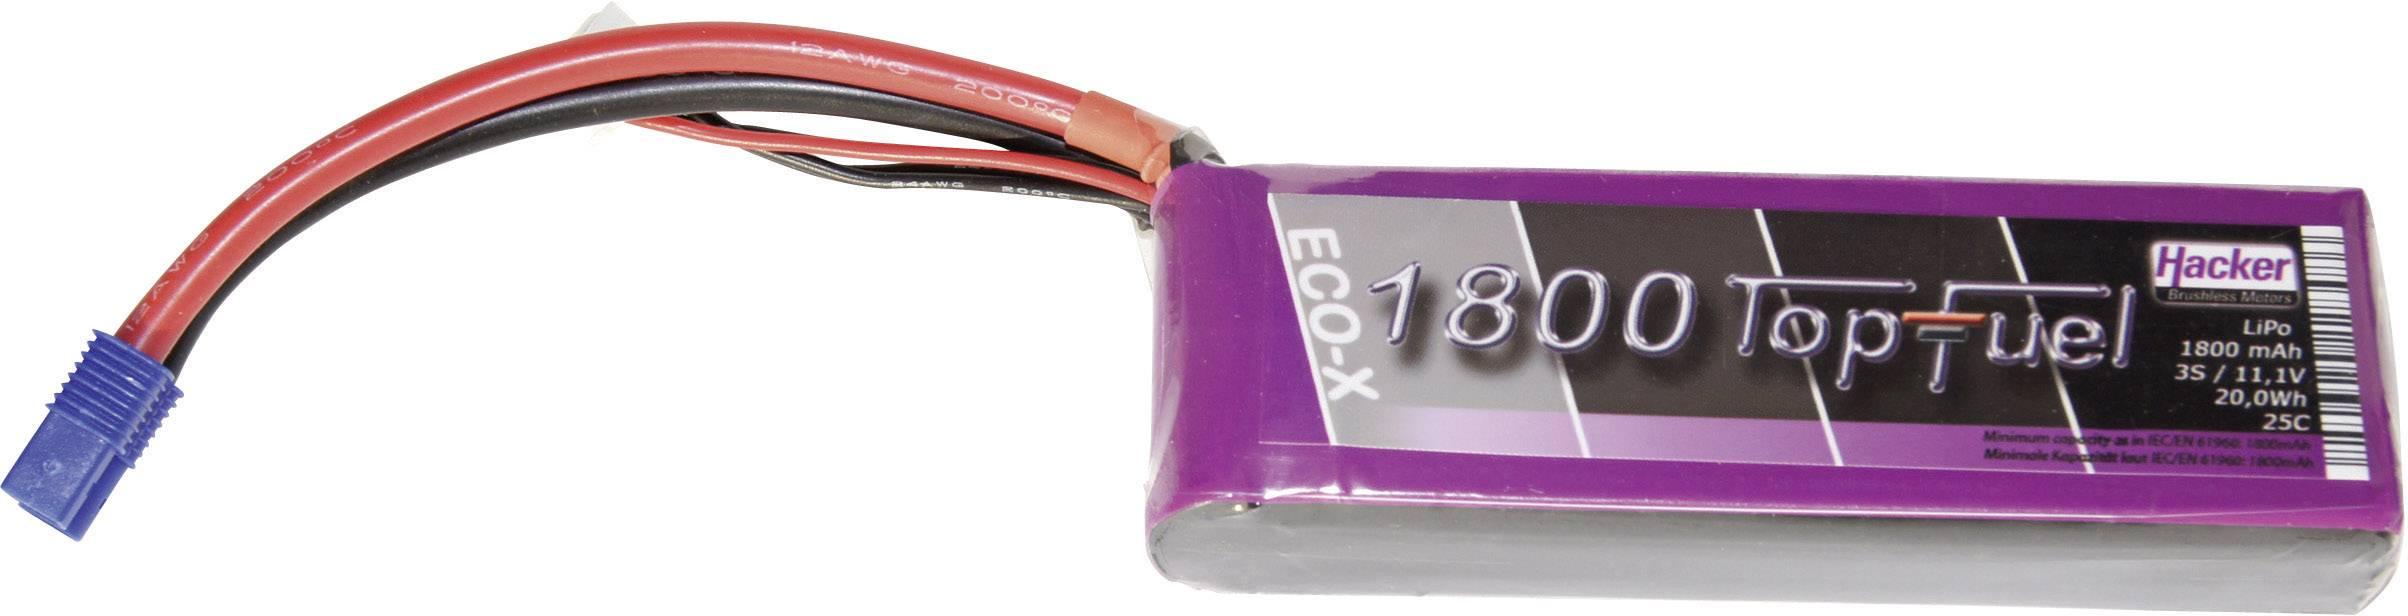 Akupack Li-Pol Hacker 21800341, 11.1 V, 1800 mAh